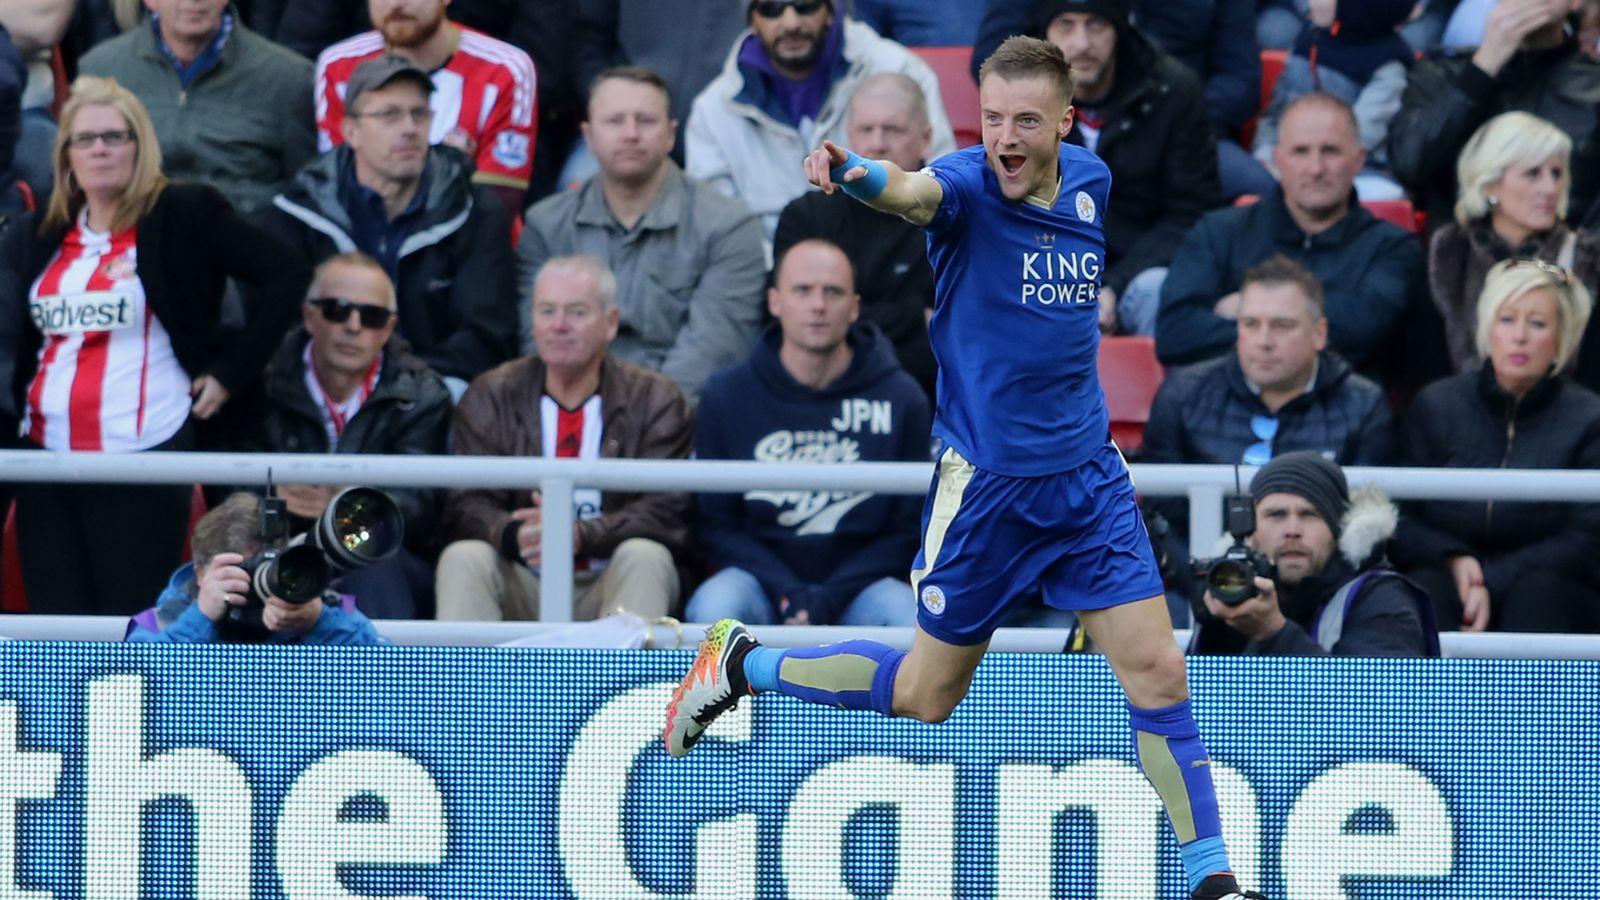 Leicester striker Vardy wins 2016 Football Writers' award